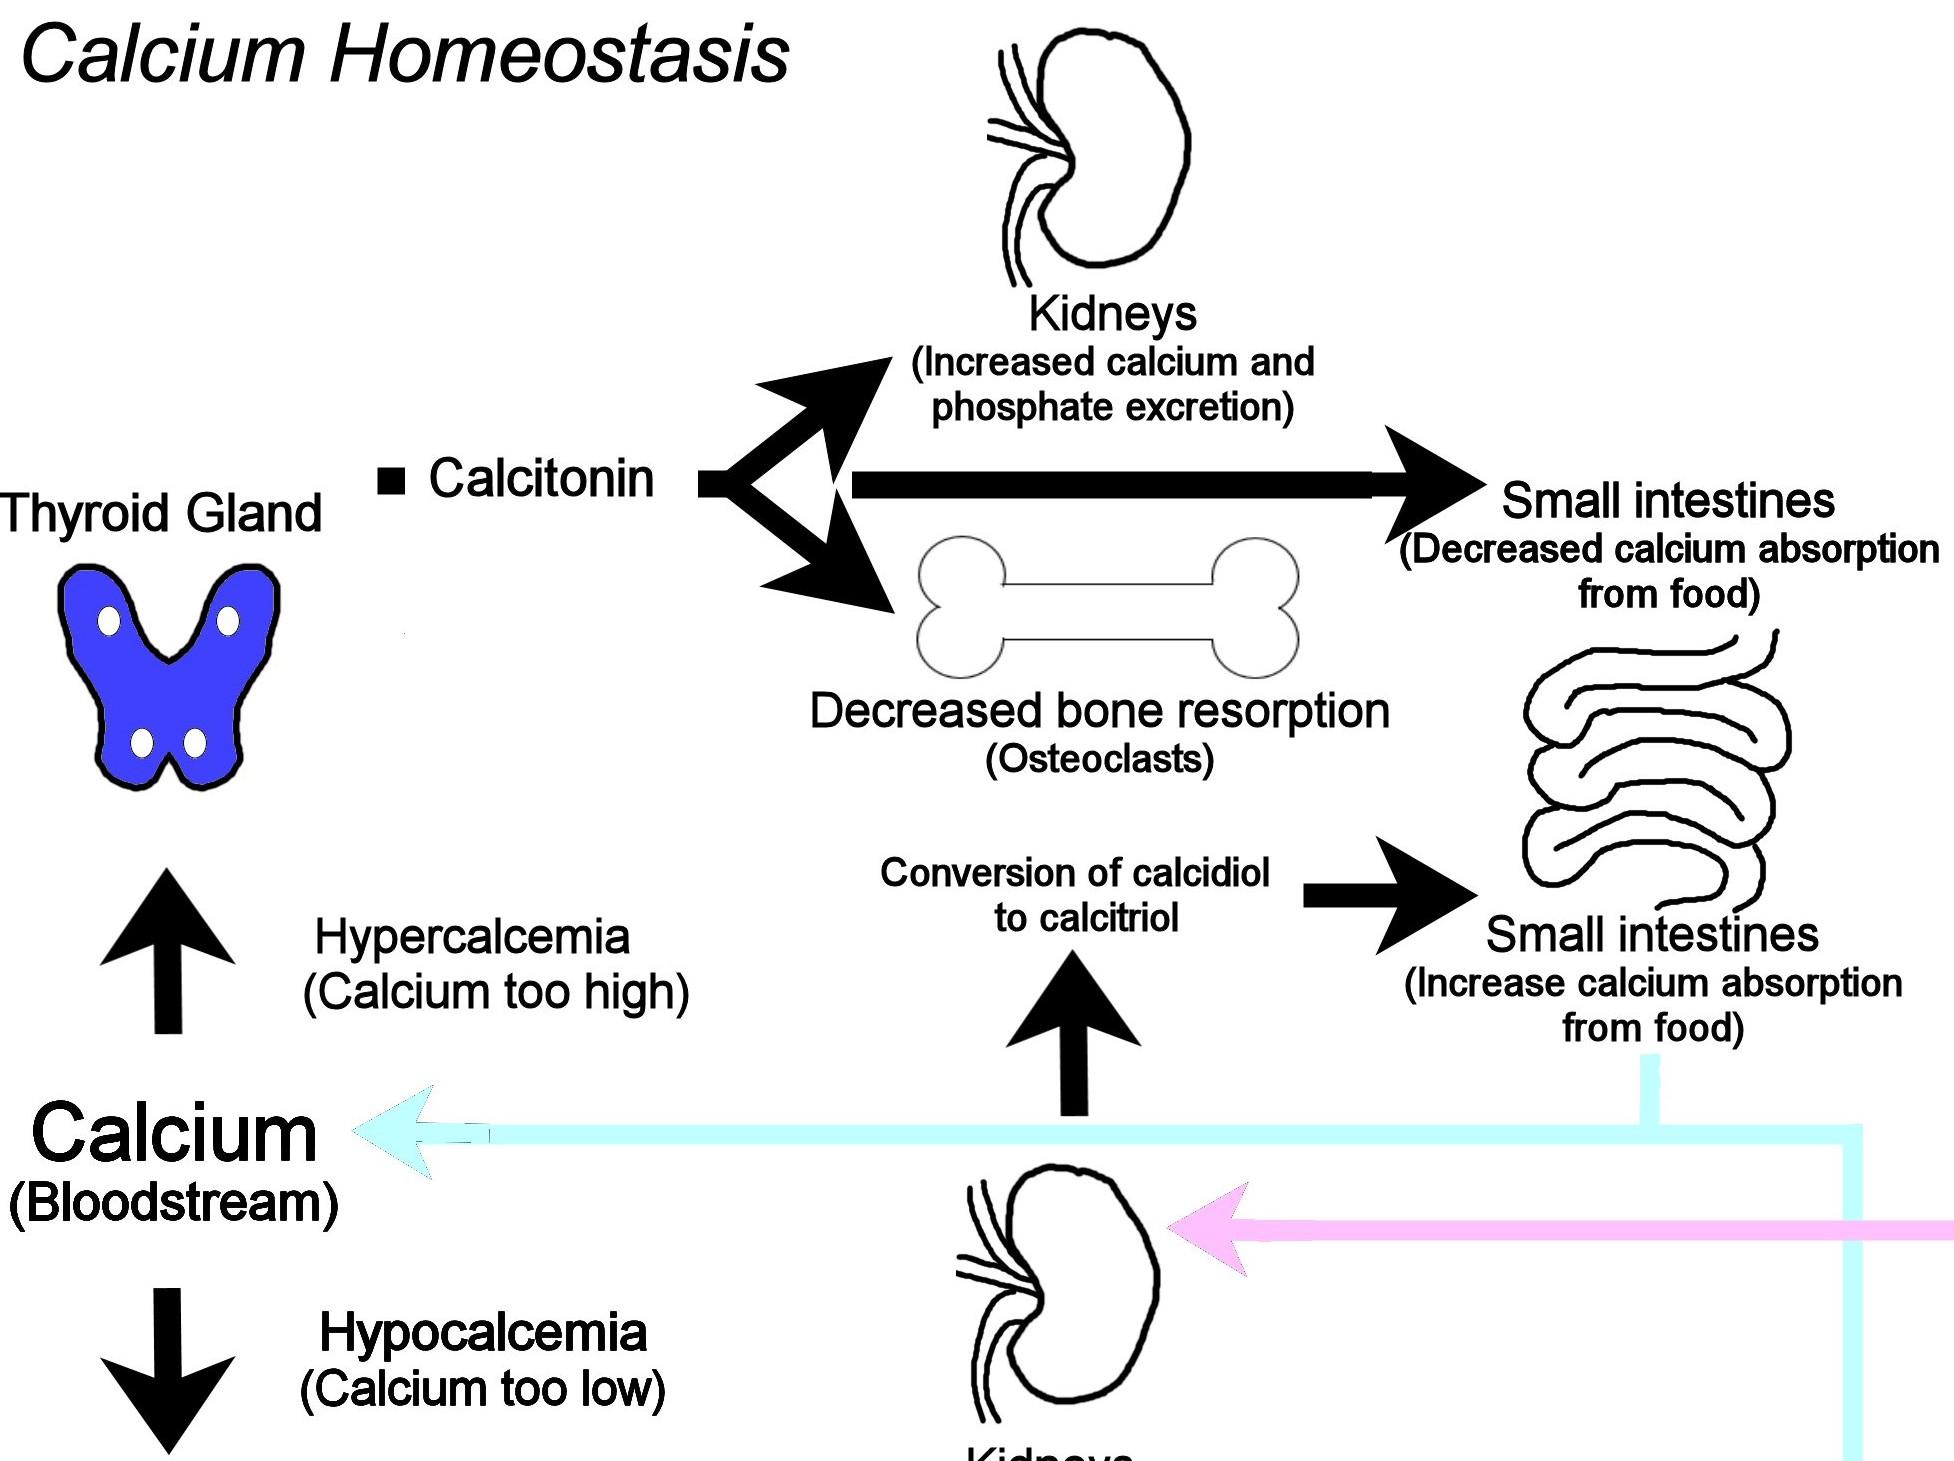 Metabolic Bone Disease In Herpetoculture